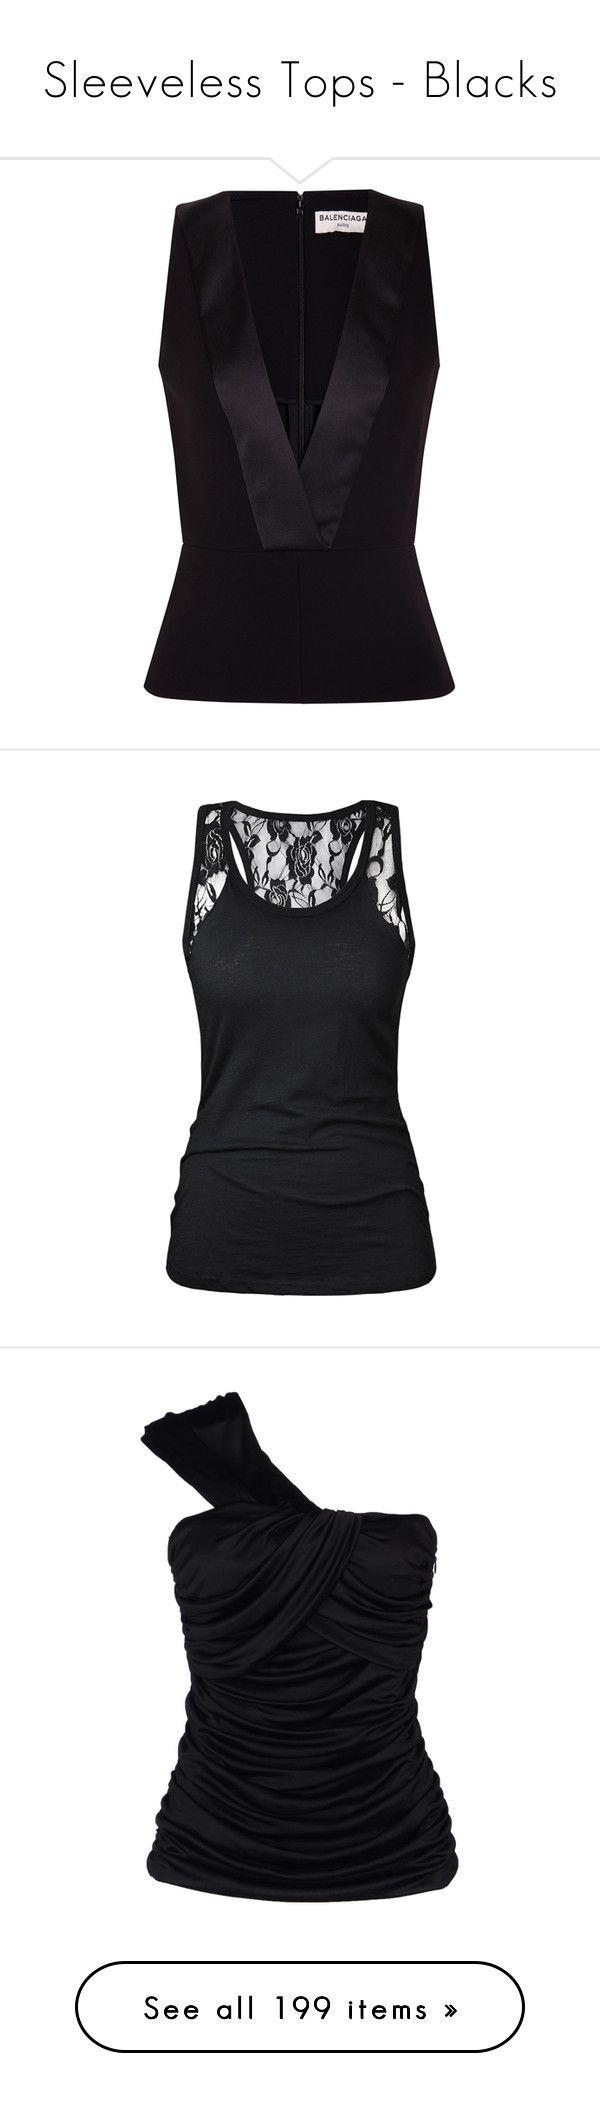 """Sleeveless Tops - Blacks"" by jacci0528 ❤ liked on Polyvore featuring tops, shirts, blusas, blouses, tanks, black, peplum shirt, shirt top, balenciaga and balenciaga shirt"